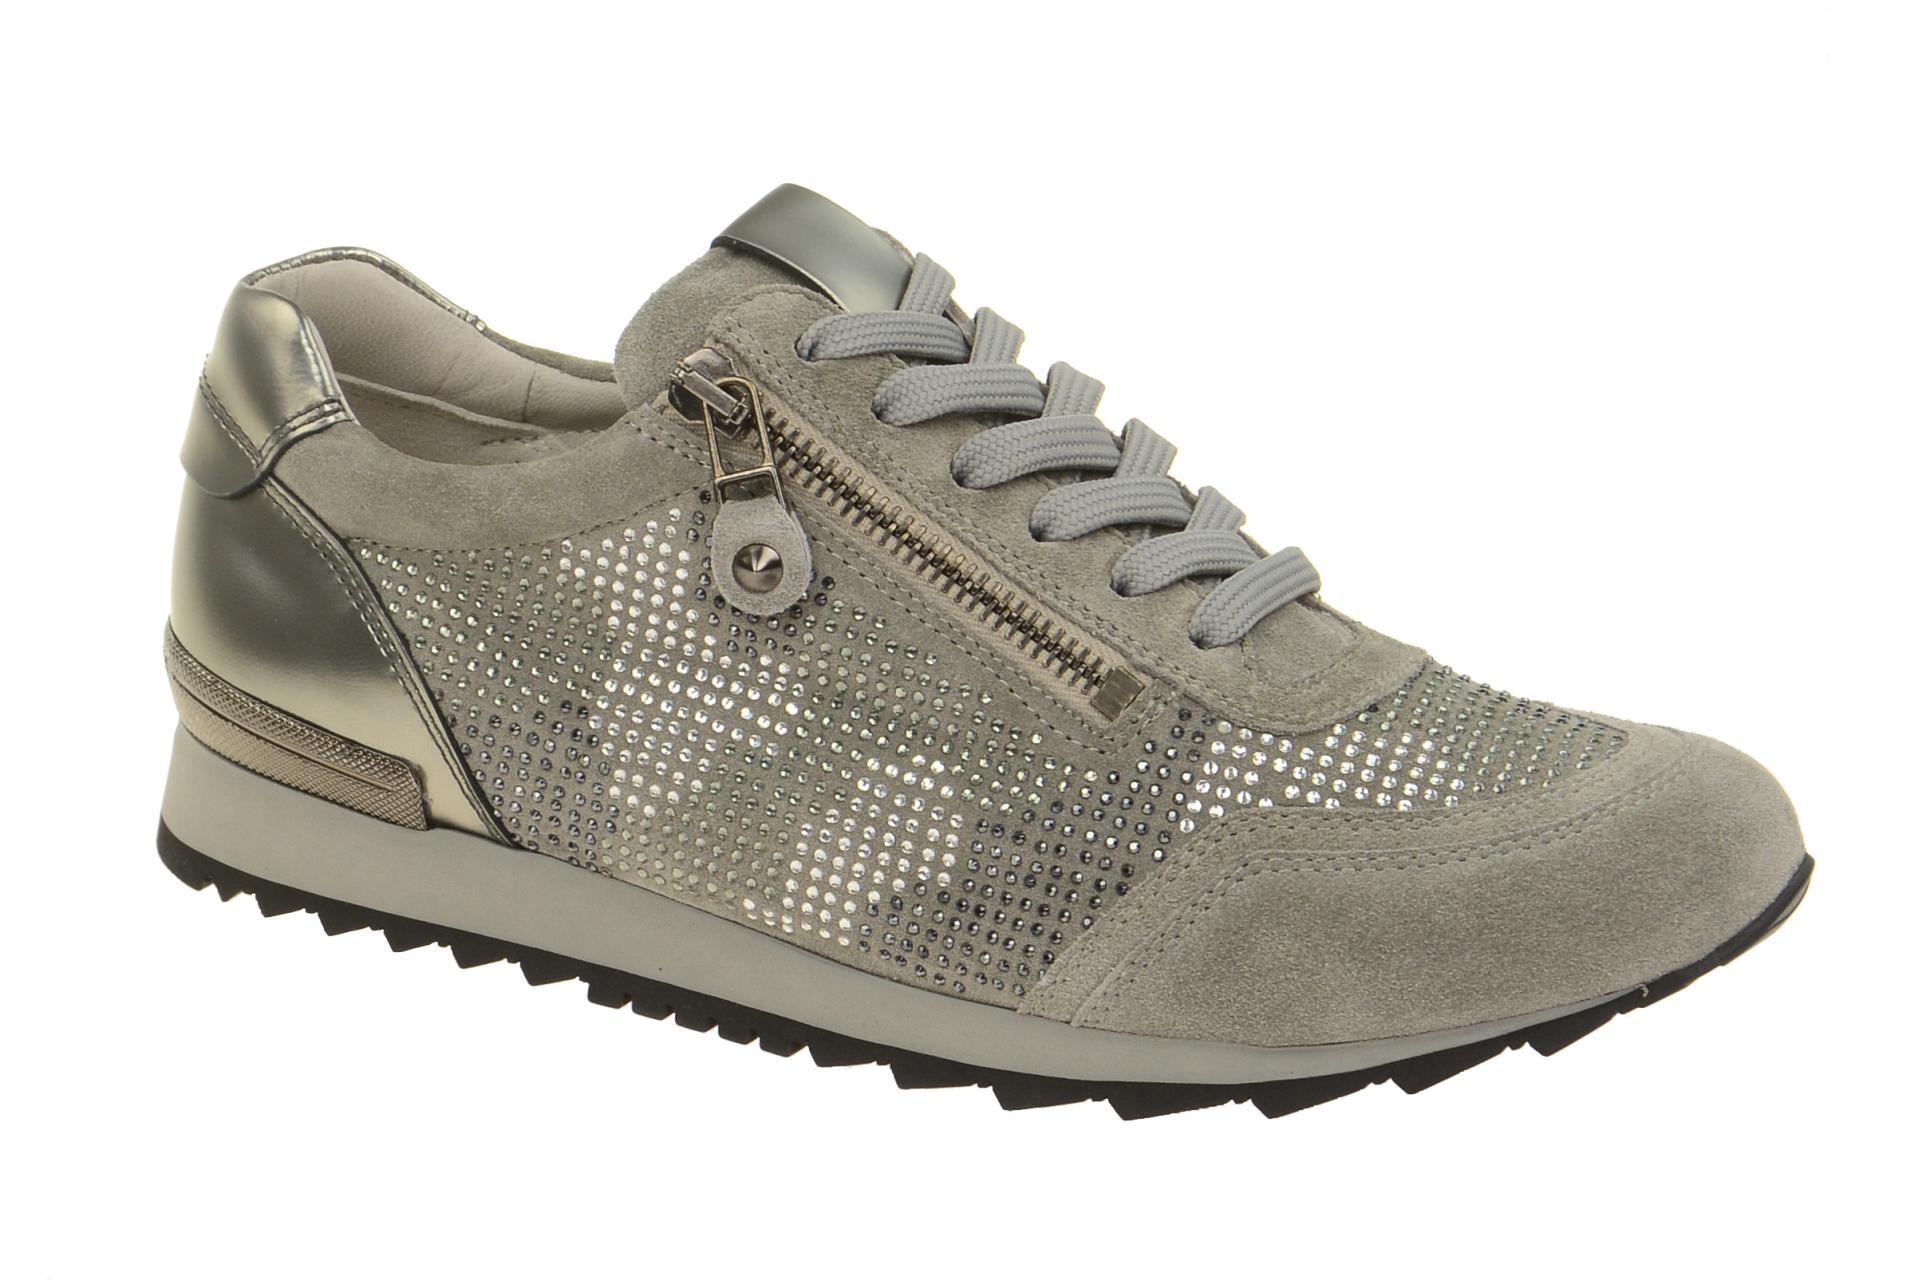 k s runner schuhe grau stone sneaker 18470 schuhhaus strauch shop. Black Bedroom Furniture Sets. Home Design Ideas